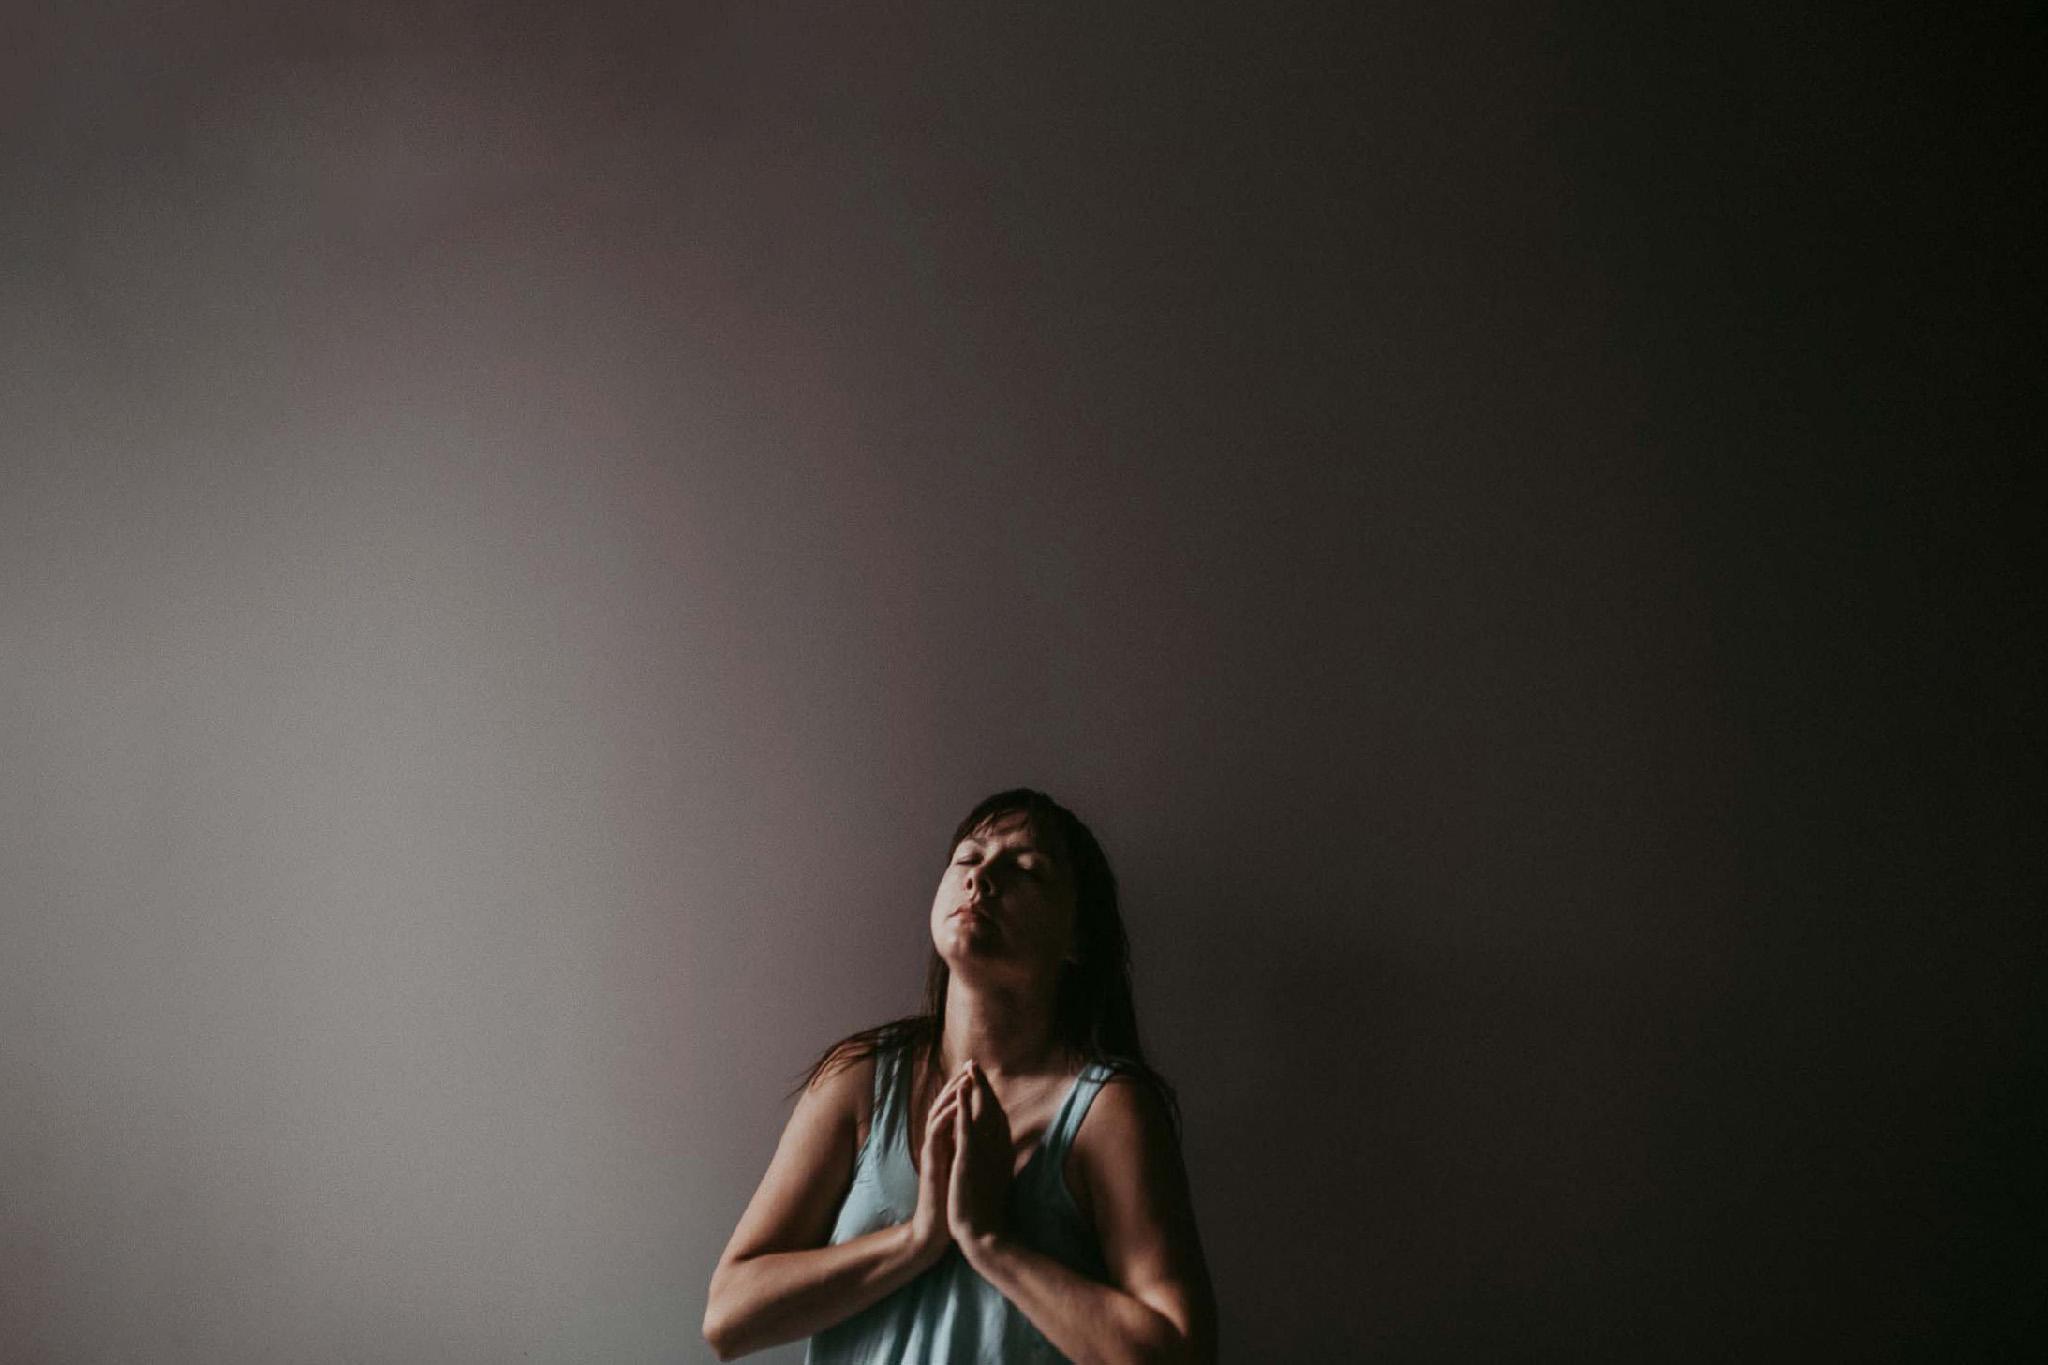 Olga Levien: Self-Portrait